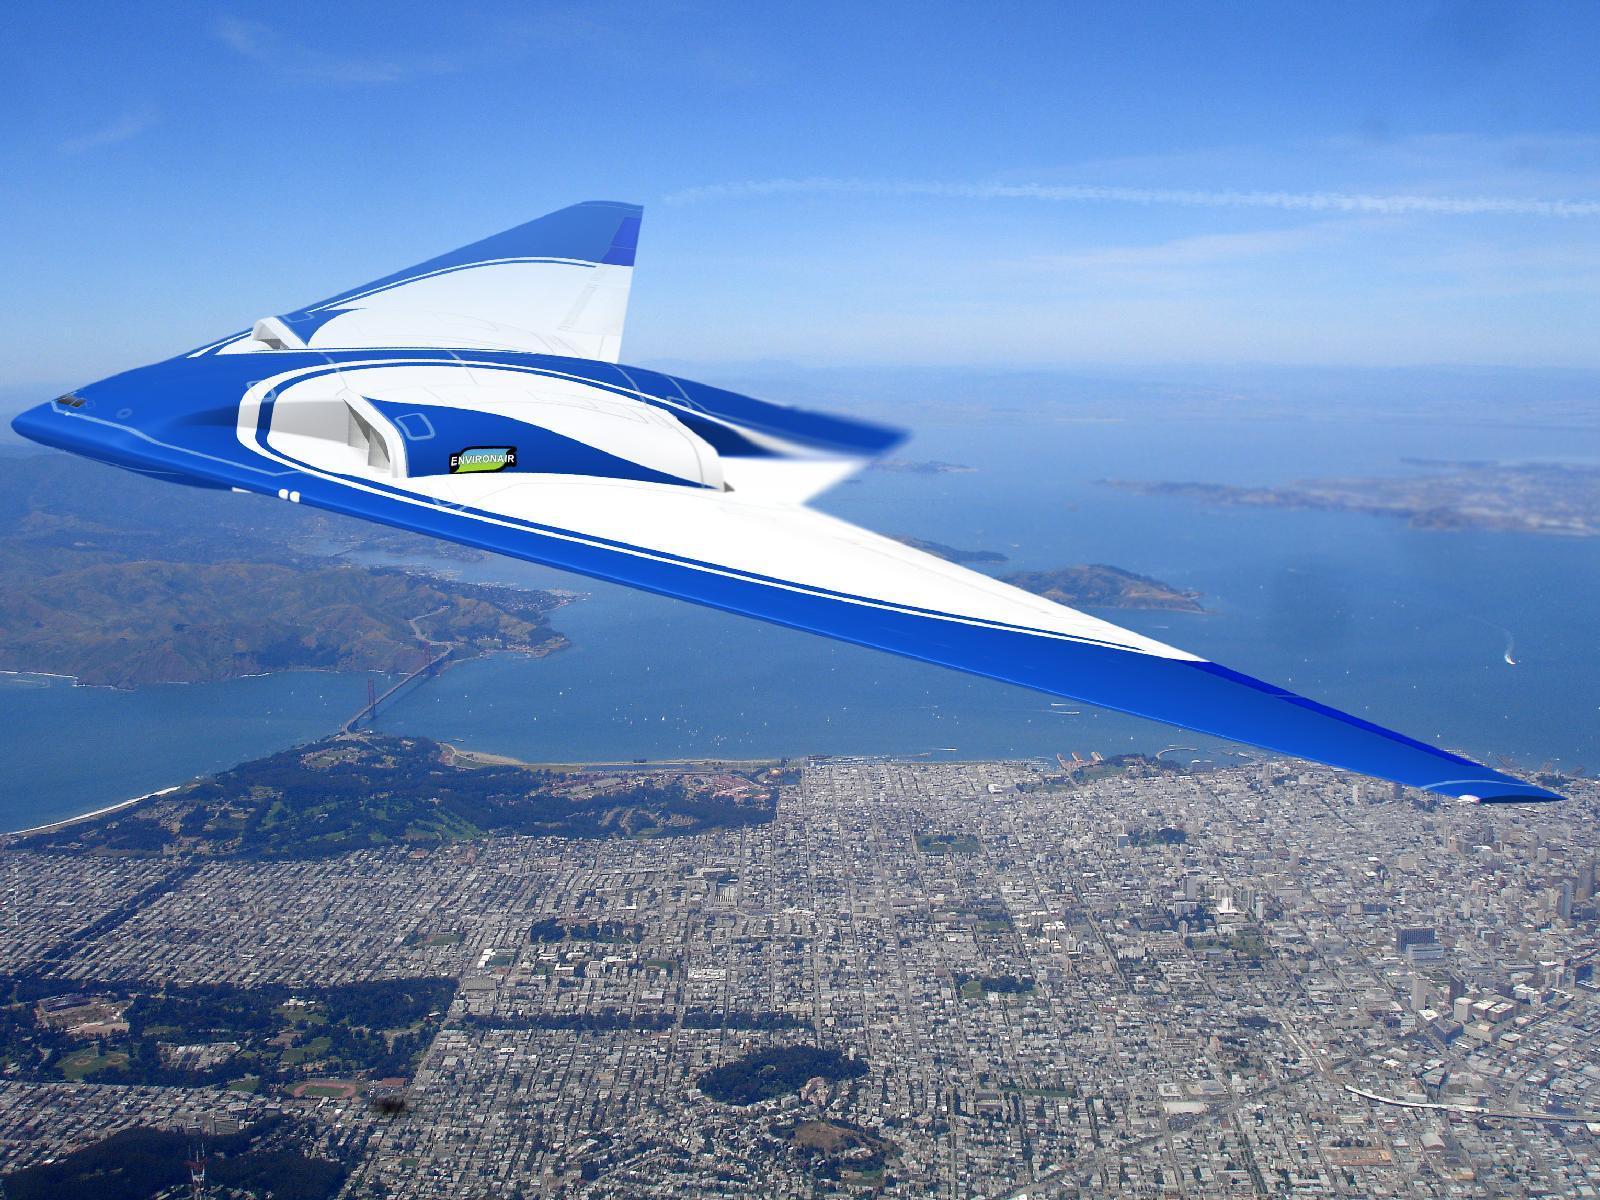 Northrop Grumman' Possible Flying Wing